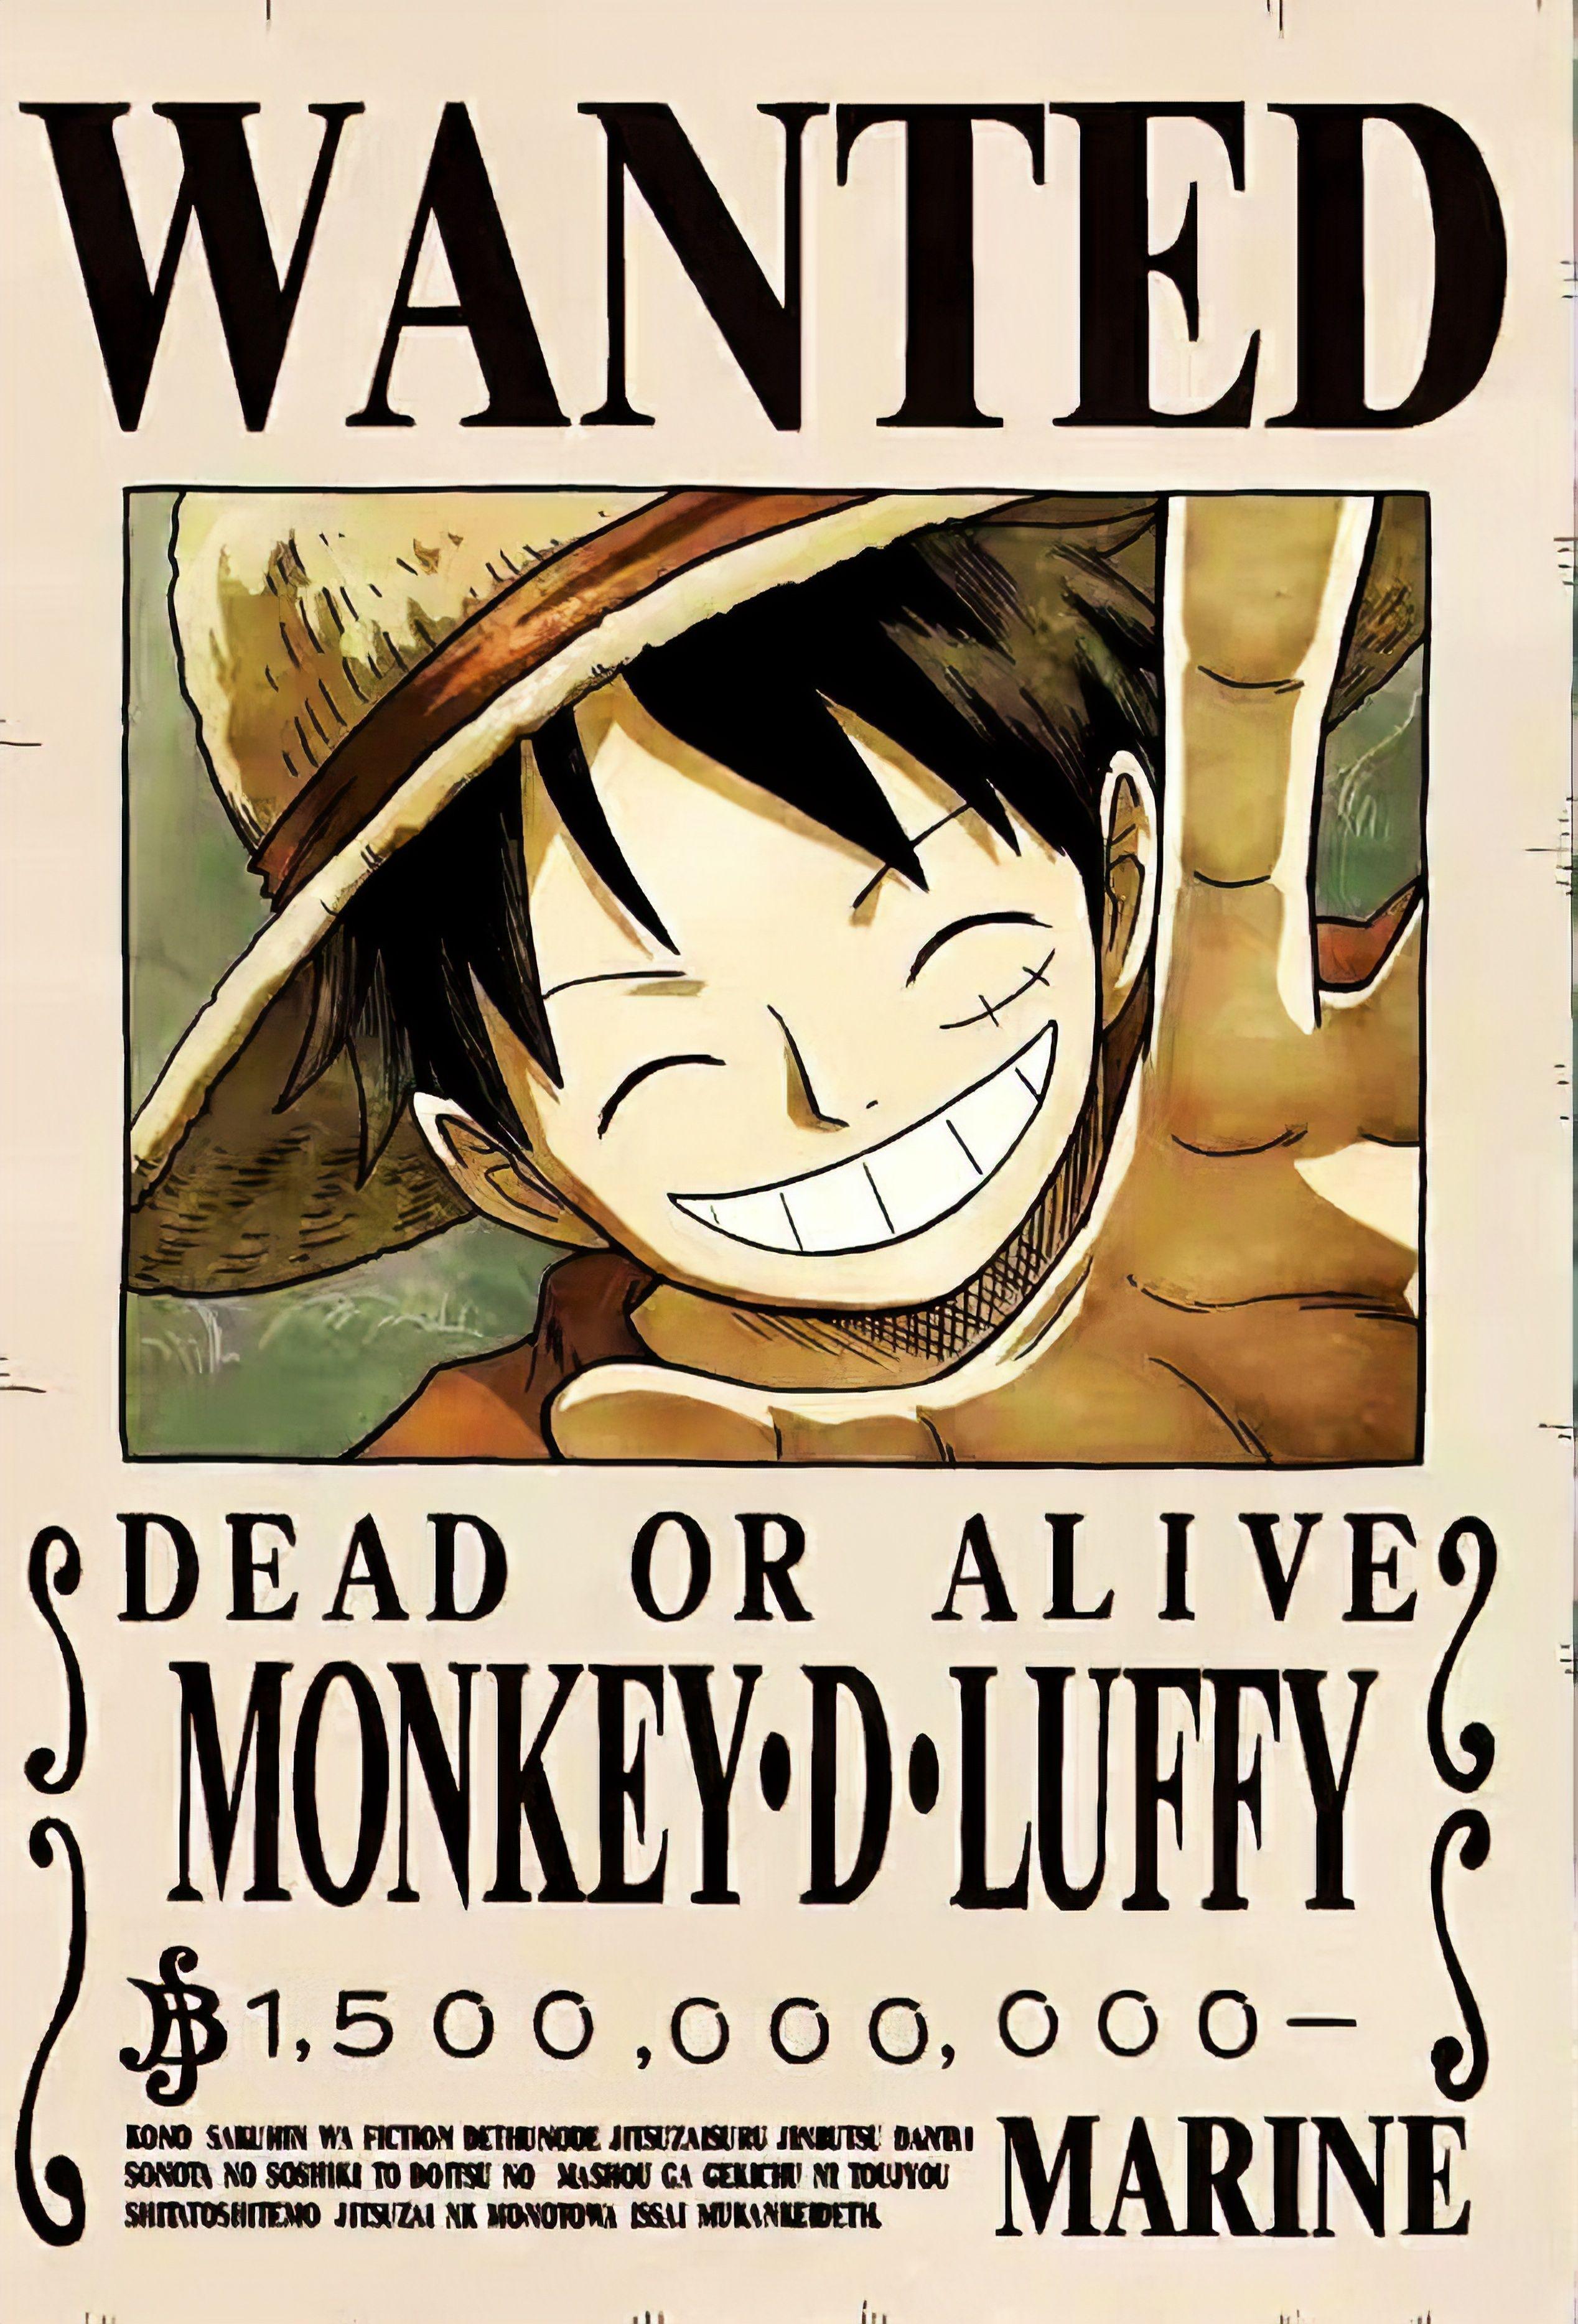 Luffy 1 5 Billion Bounty Poster 4k Topi Jerami Kartun Seni Anime